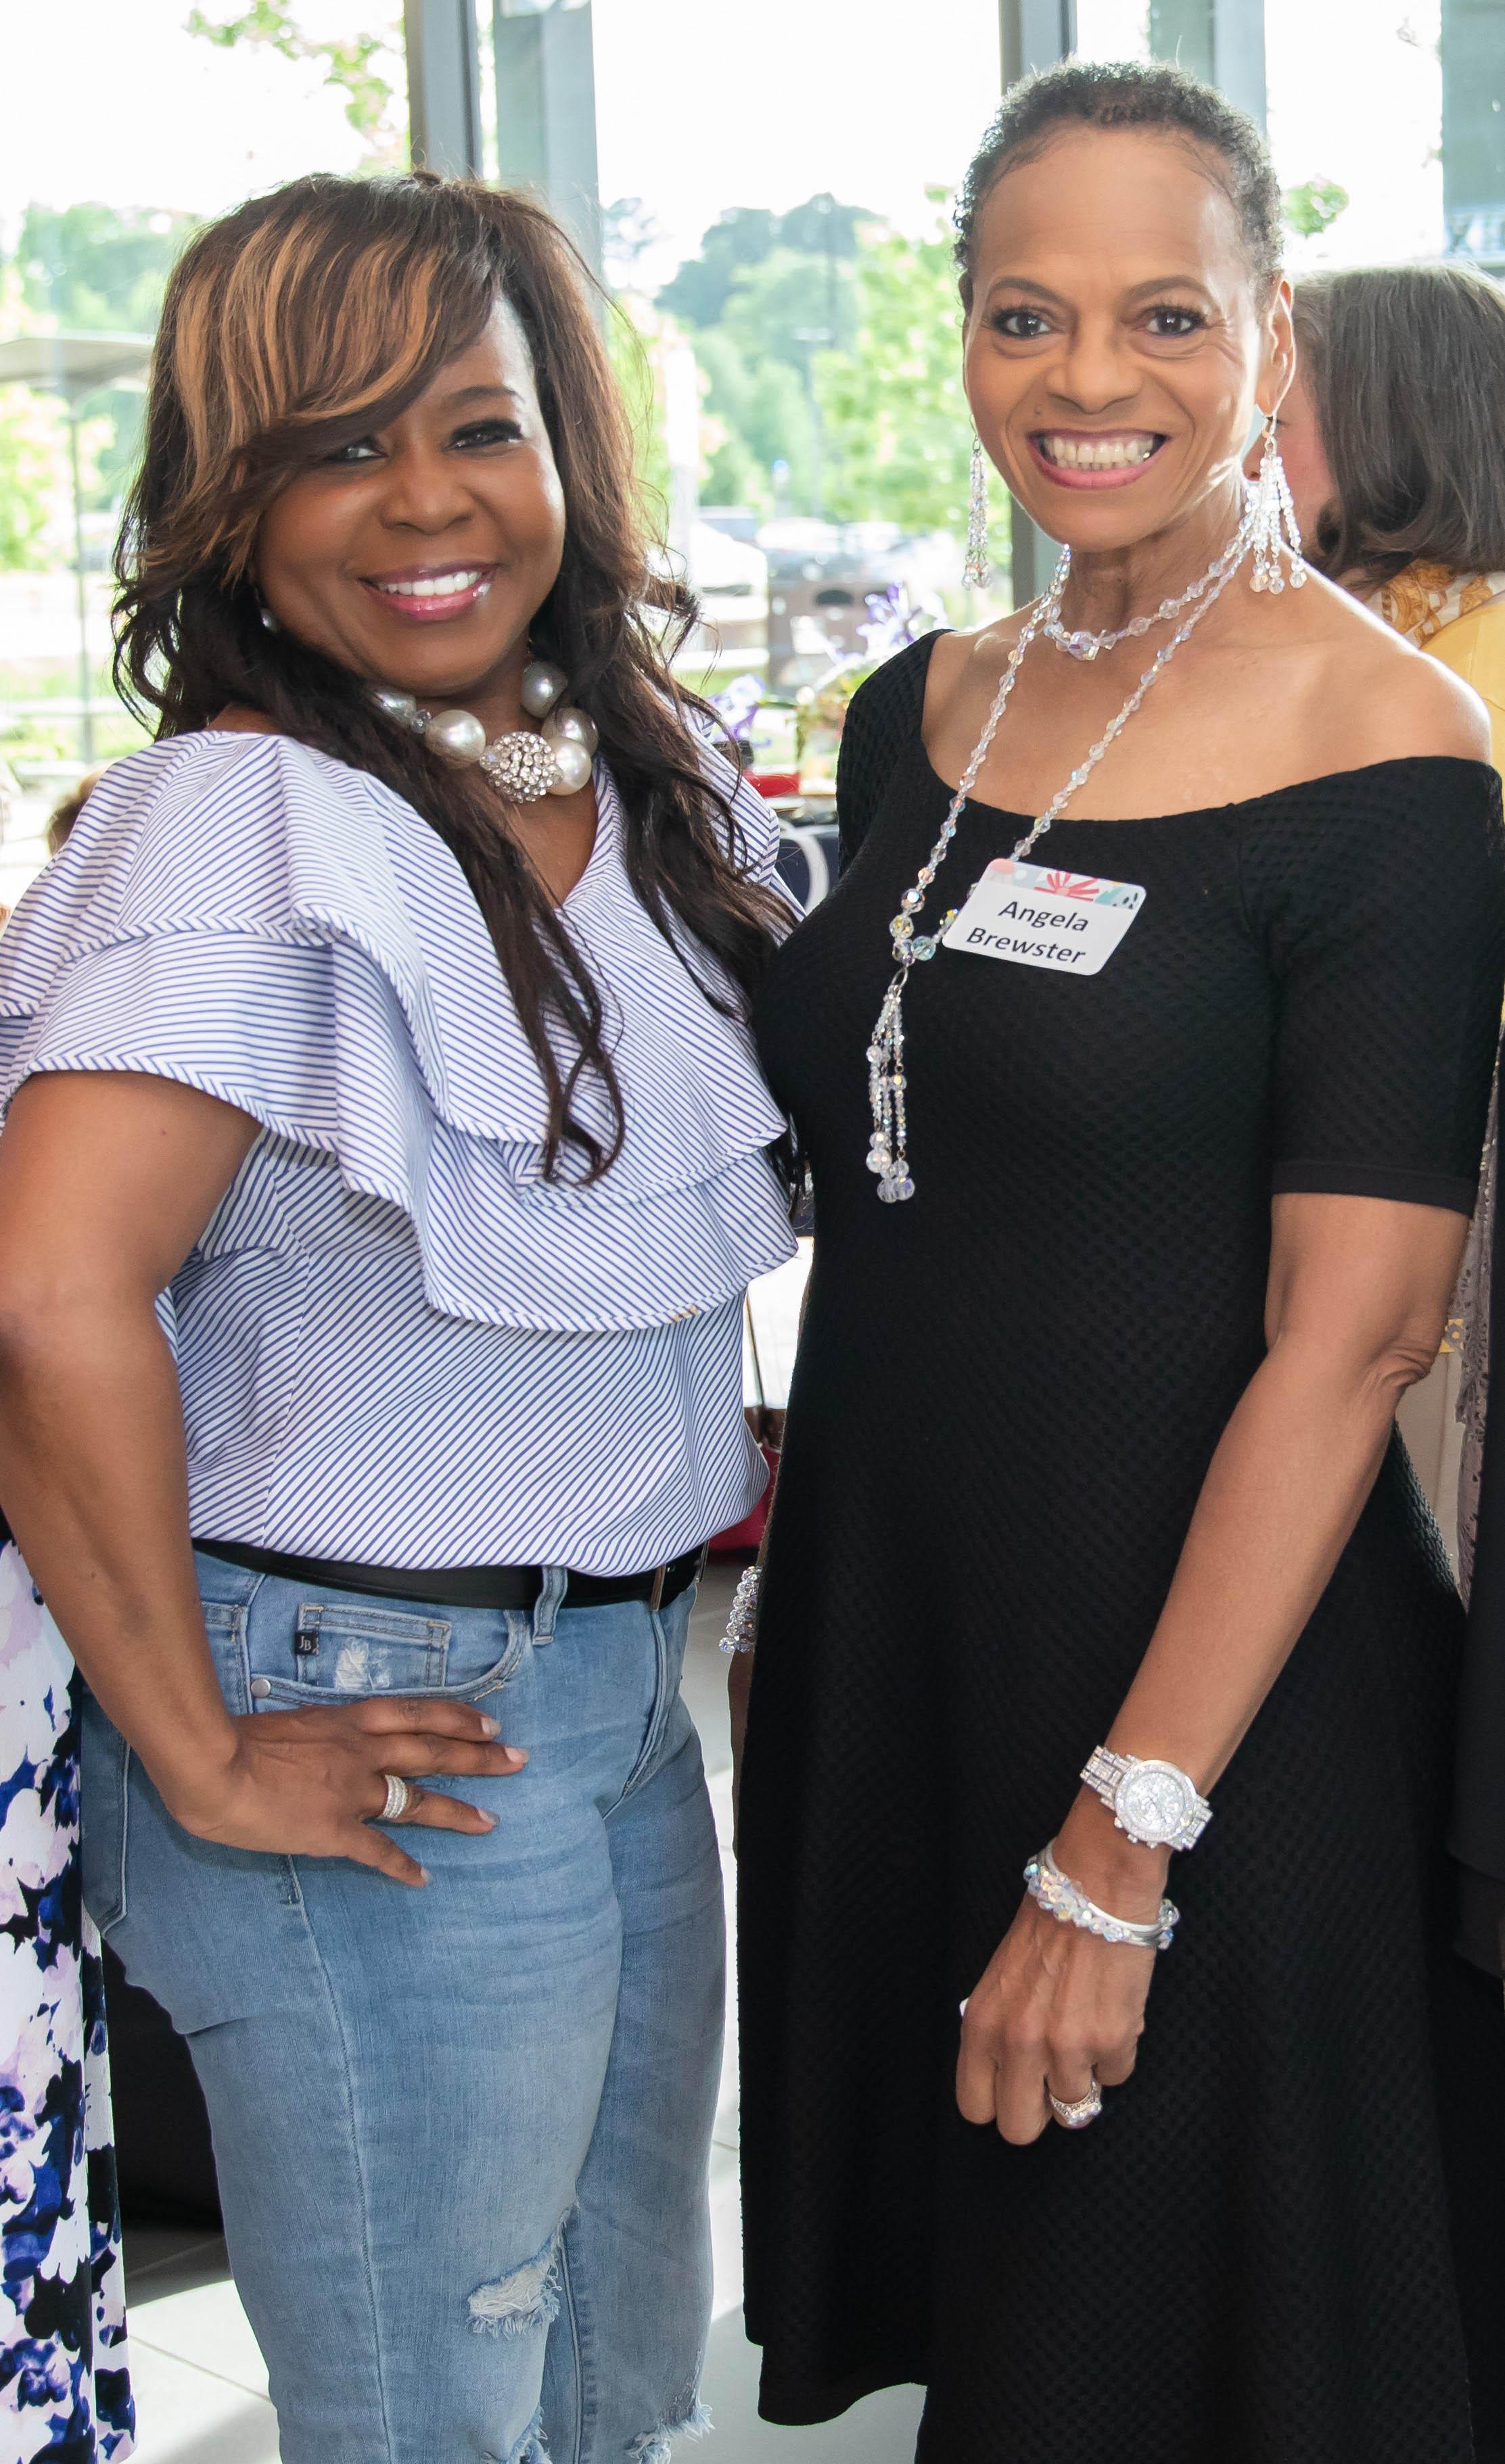 Lekia Jones and Angela Brewster